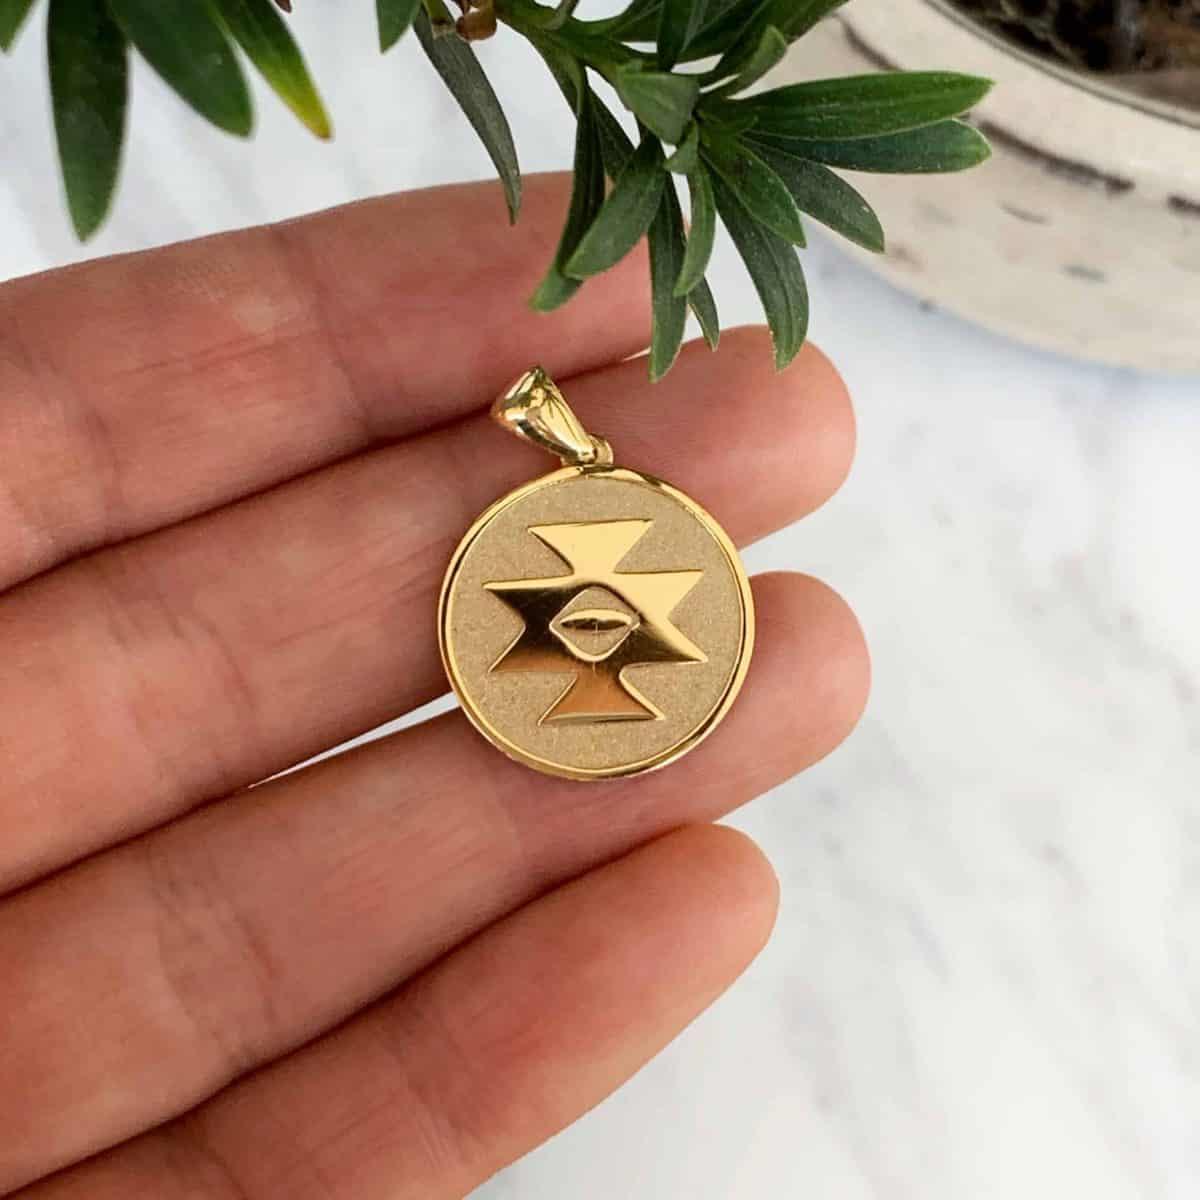 Златен двулицев медальон Канатица с диамант от колекцията Ефир Етно.